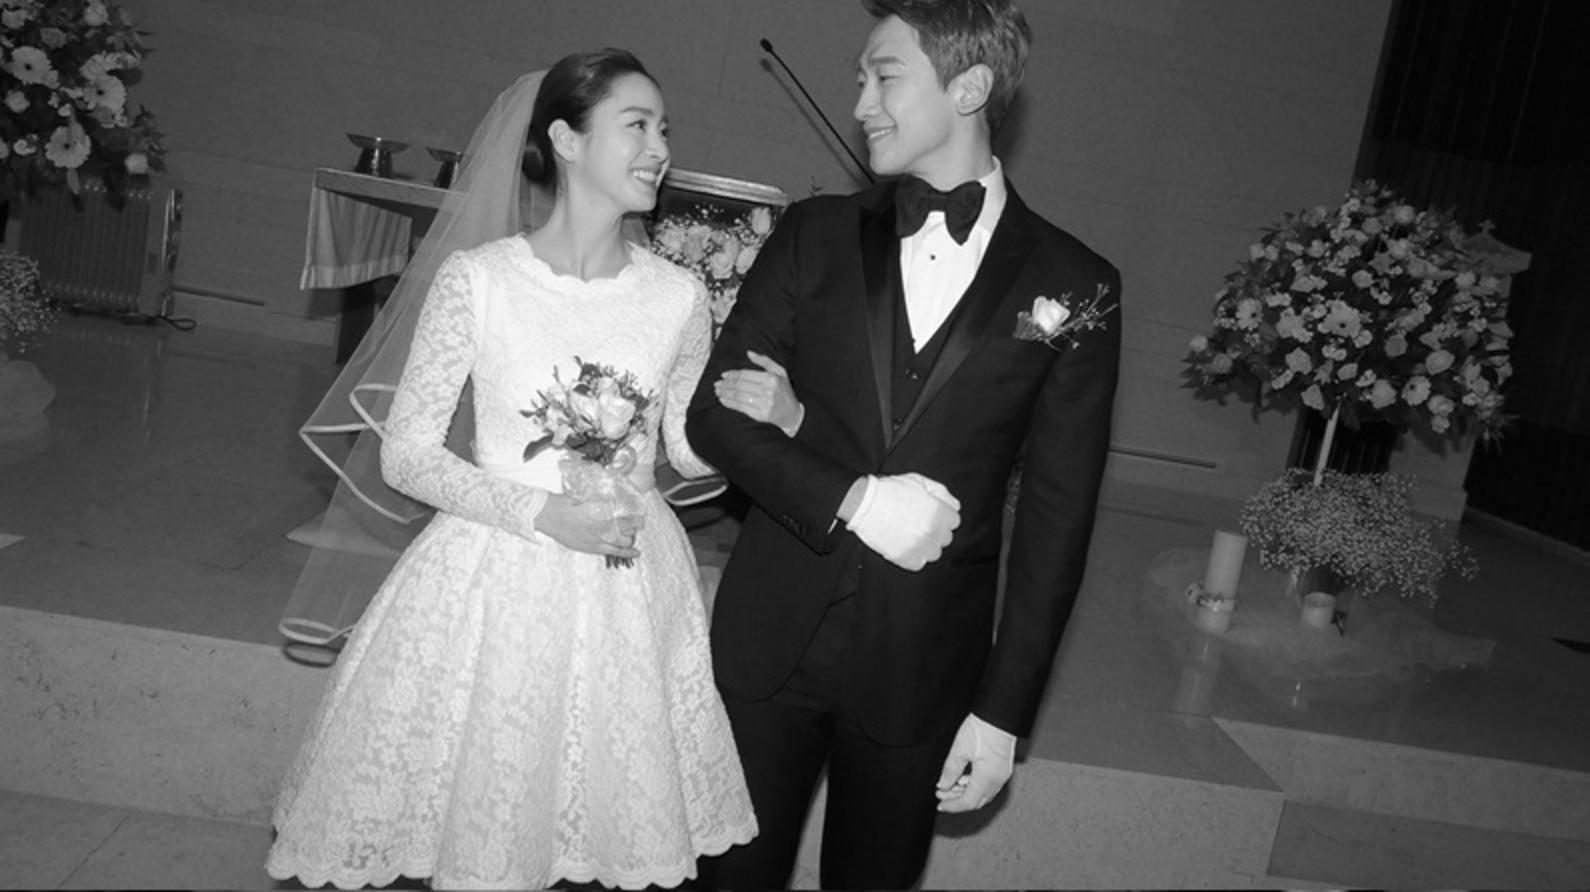 https://0.soompi.io/wp-content/uploads/2017/01/19040516/Kim-Tae-Hee-Rain.png